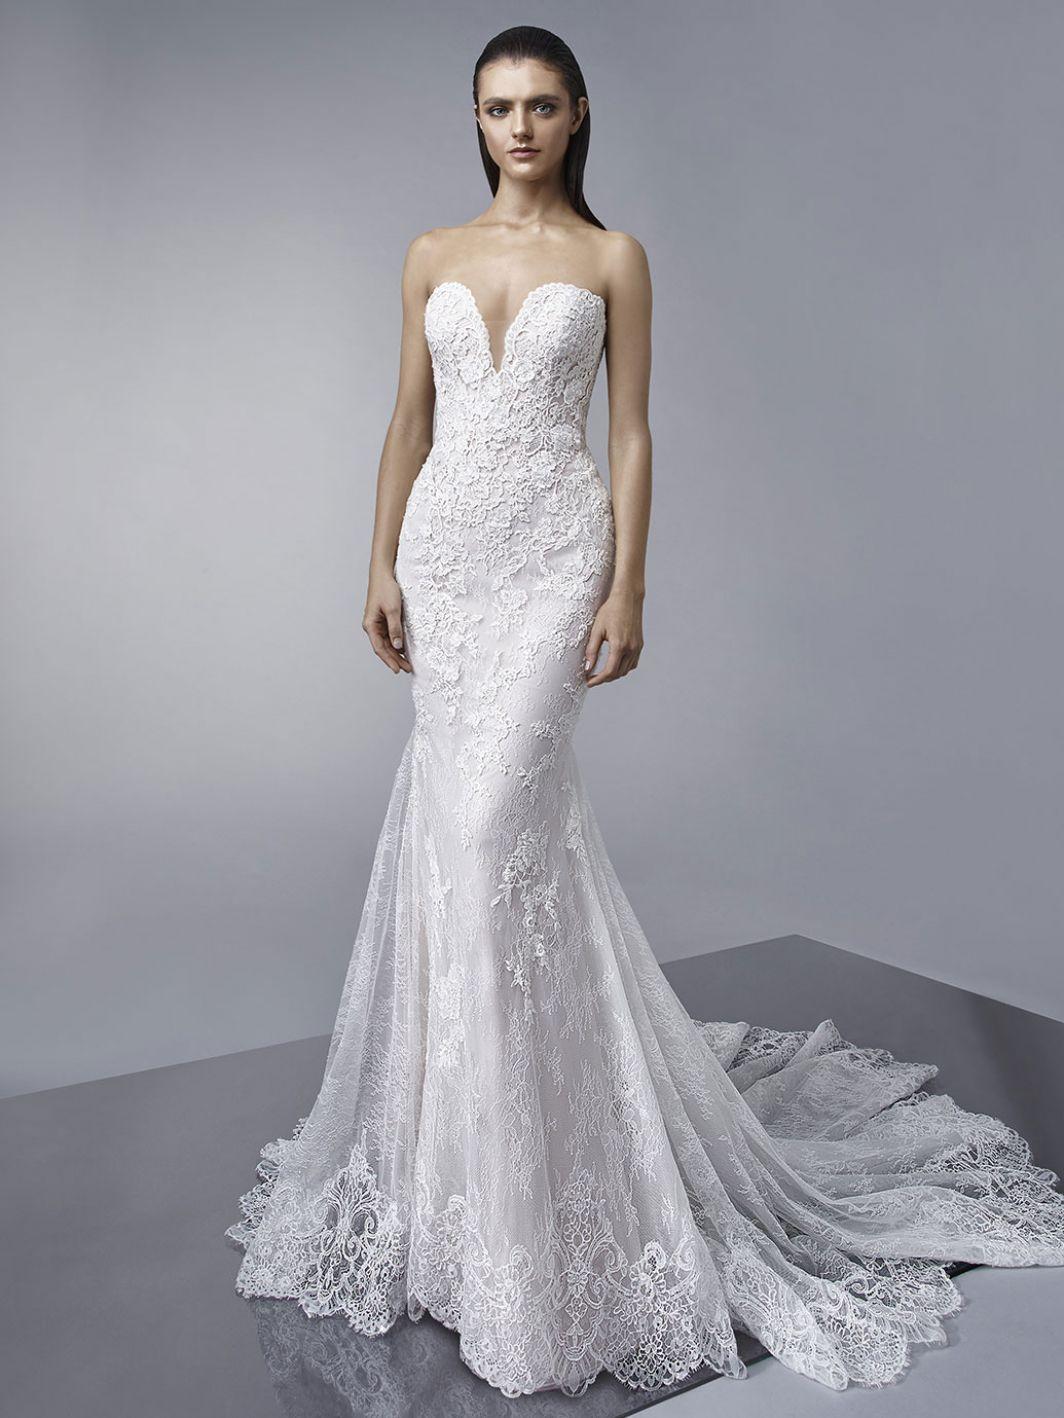 Megan Front Image Wedding dress prices, Enzoani wedding